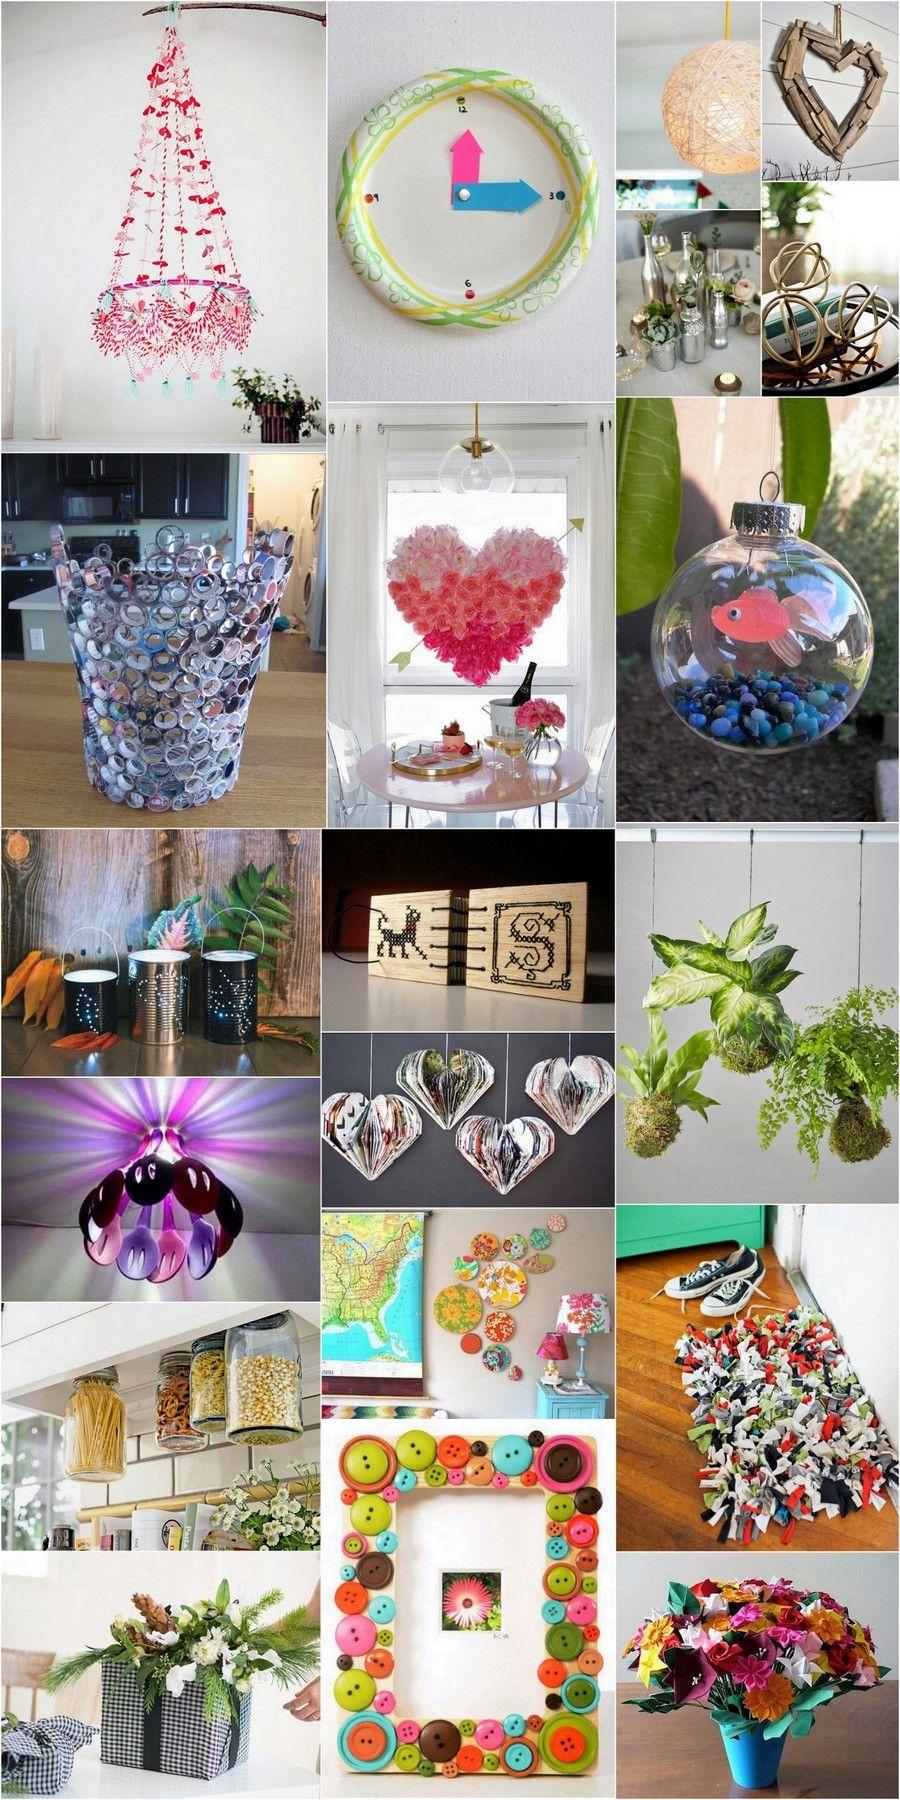 Creative Handmade Crafts Ideas for Home Decor, table